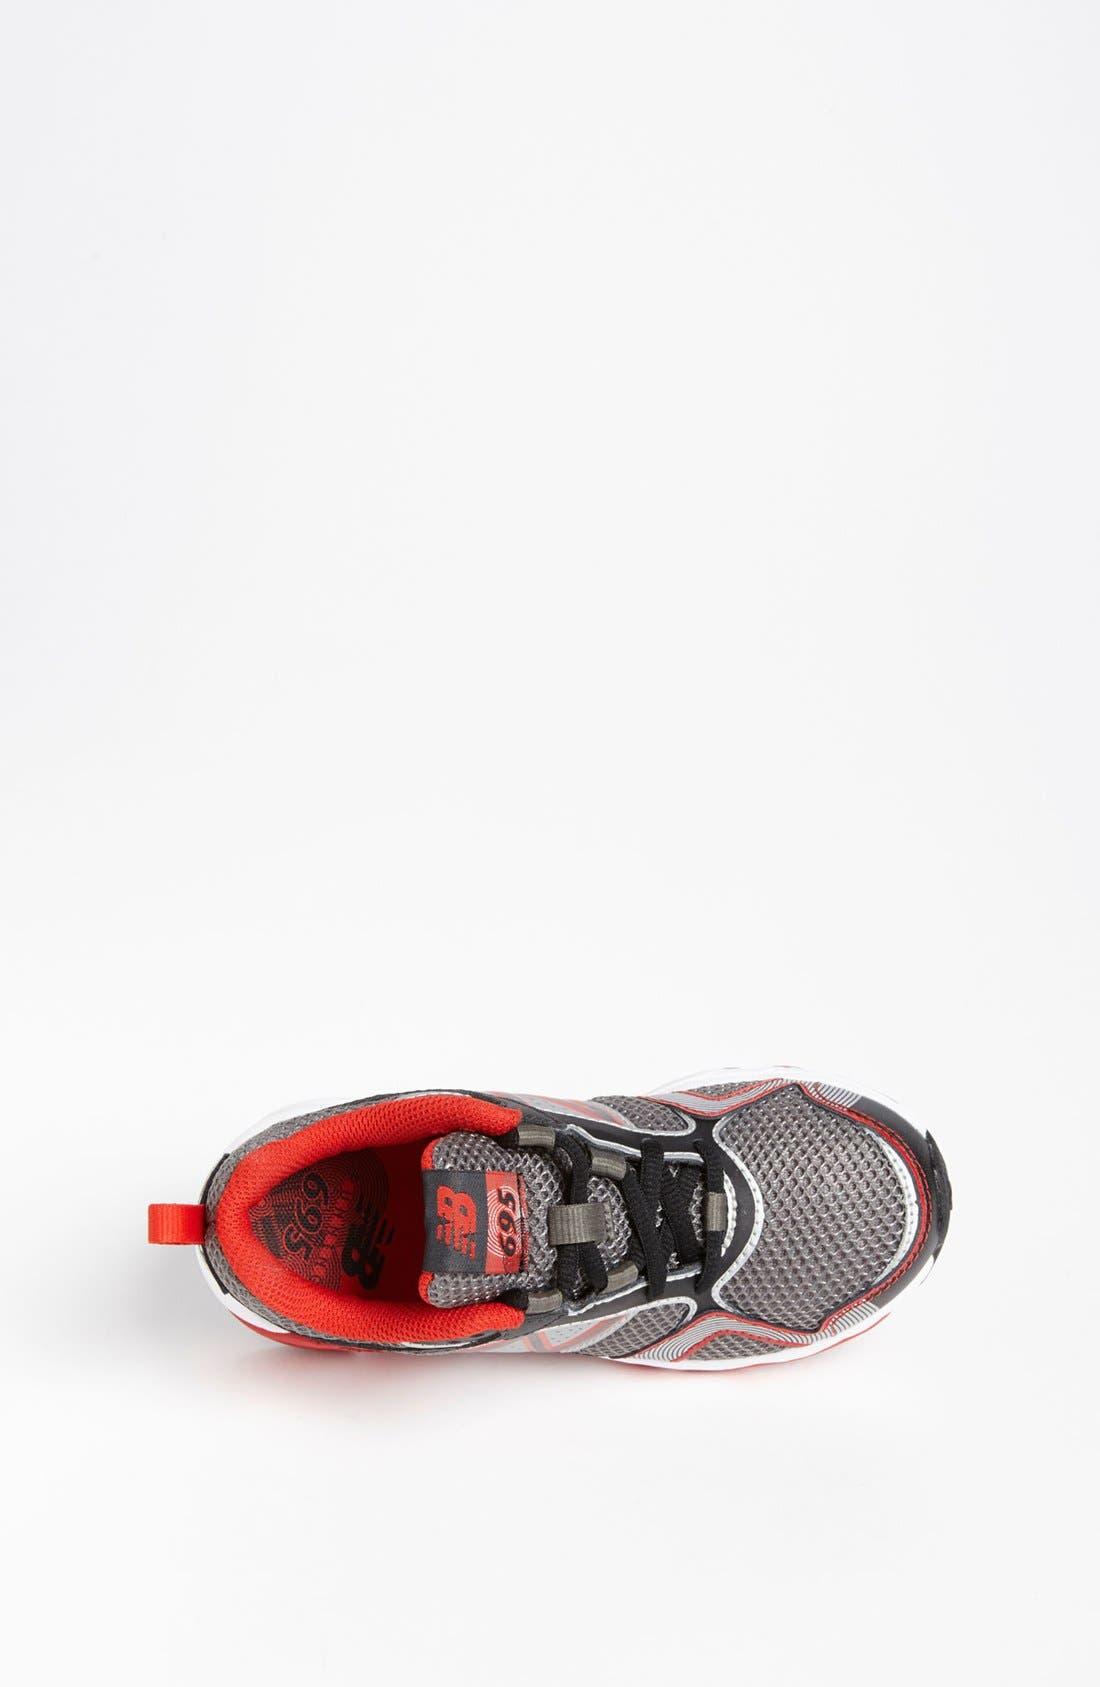 Alternate Image 3  - New Balance '695' Sneaker (Toddler, Little Kid & Big Kid) (Online Only)